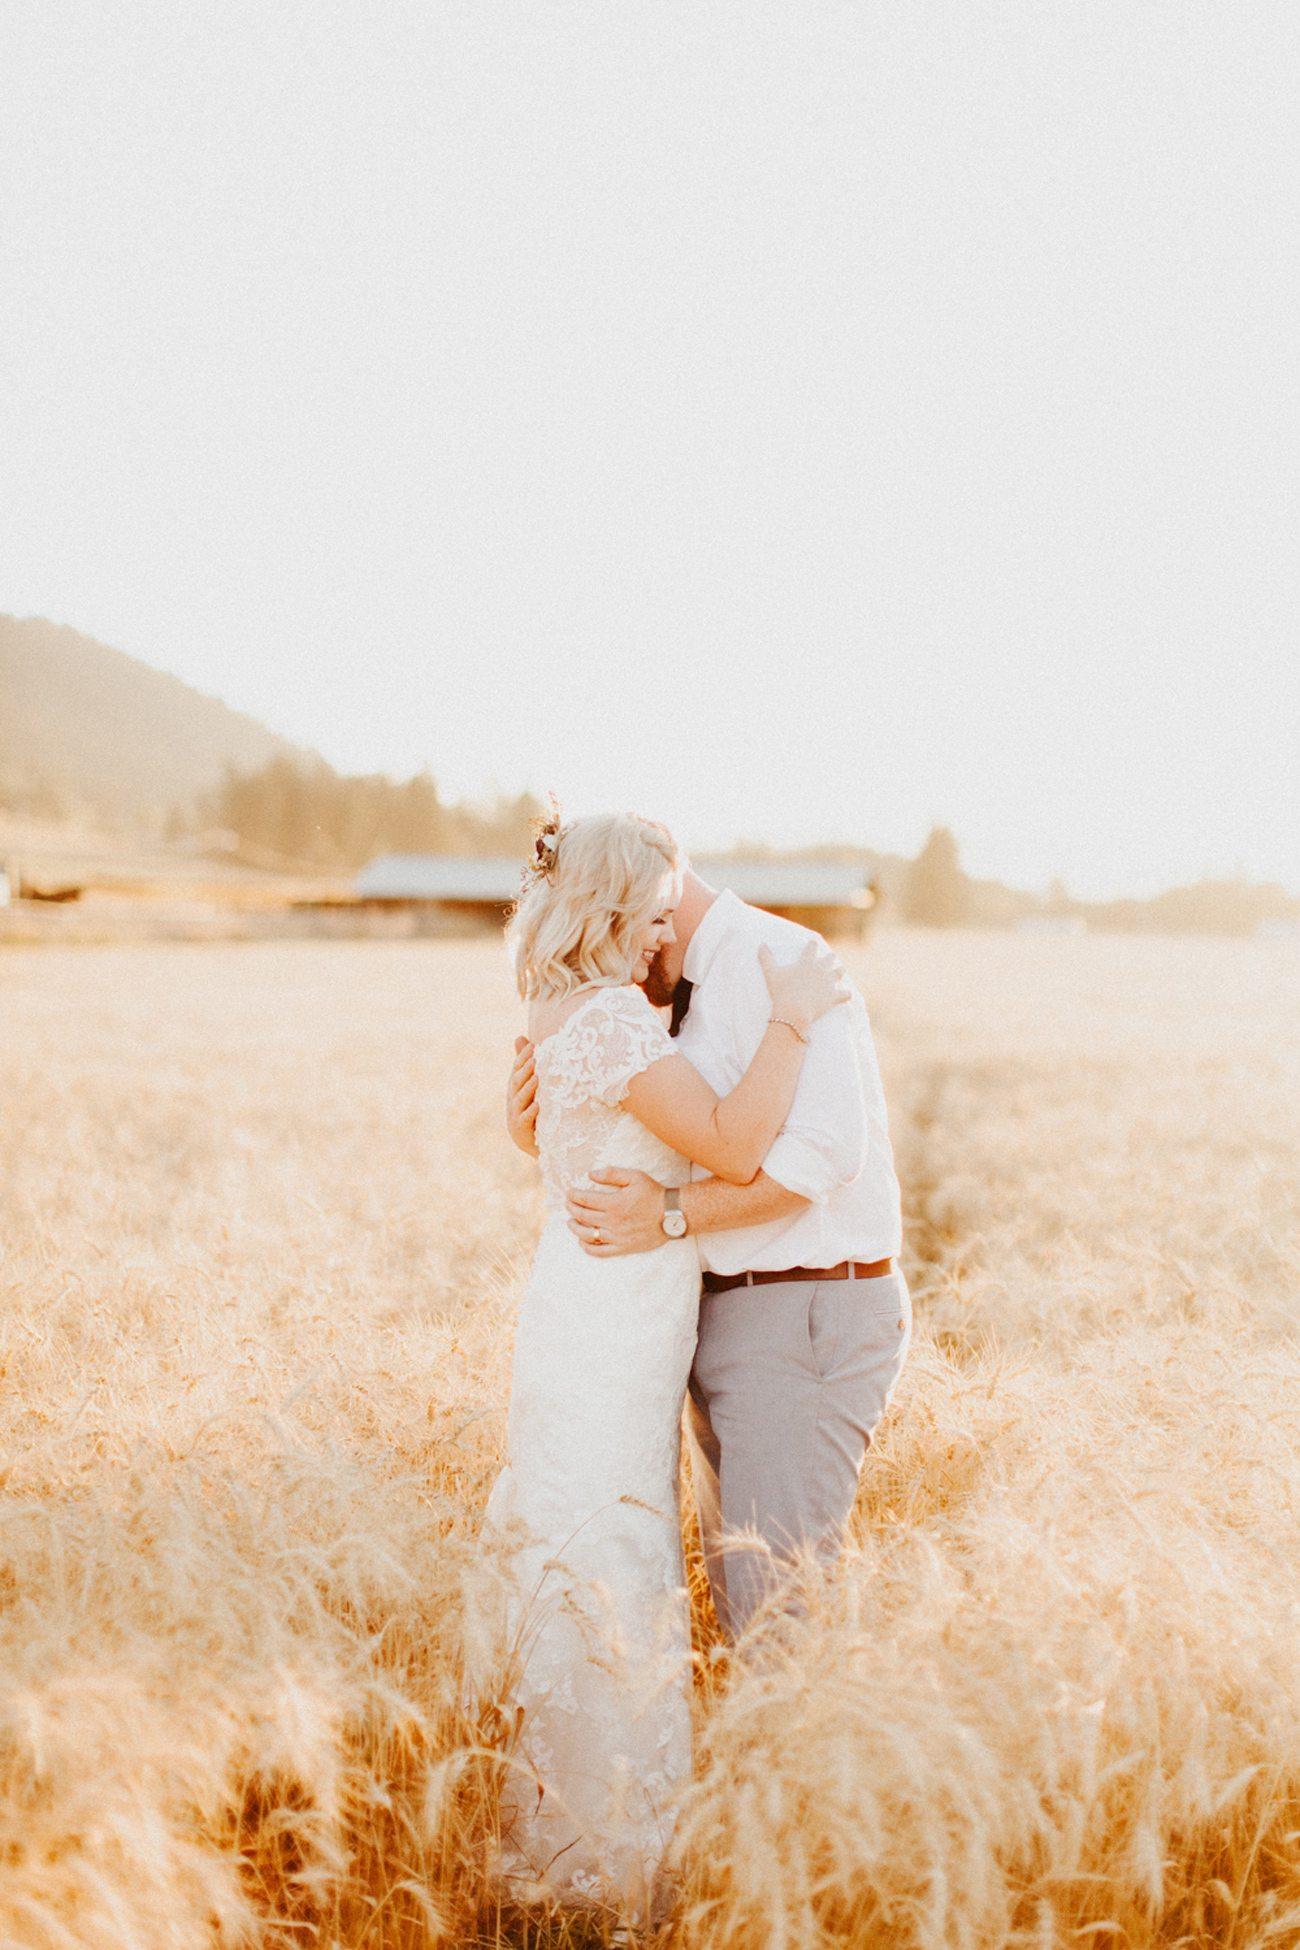 363-vernon-wedding-photographer